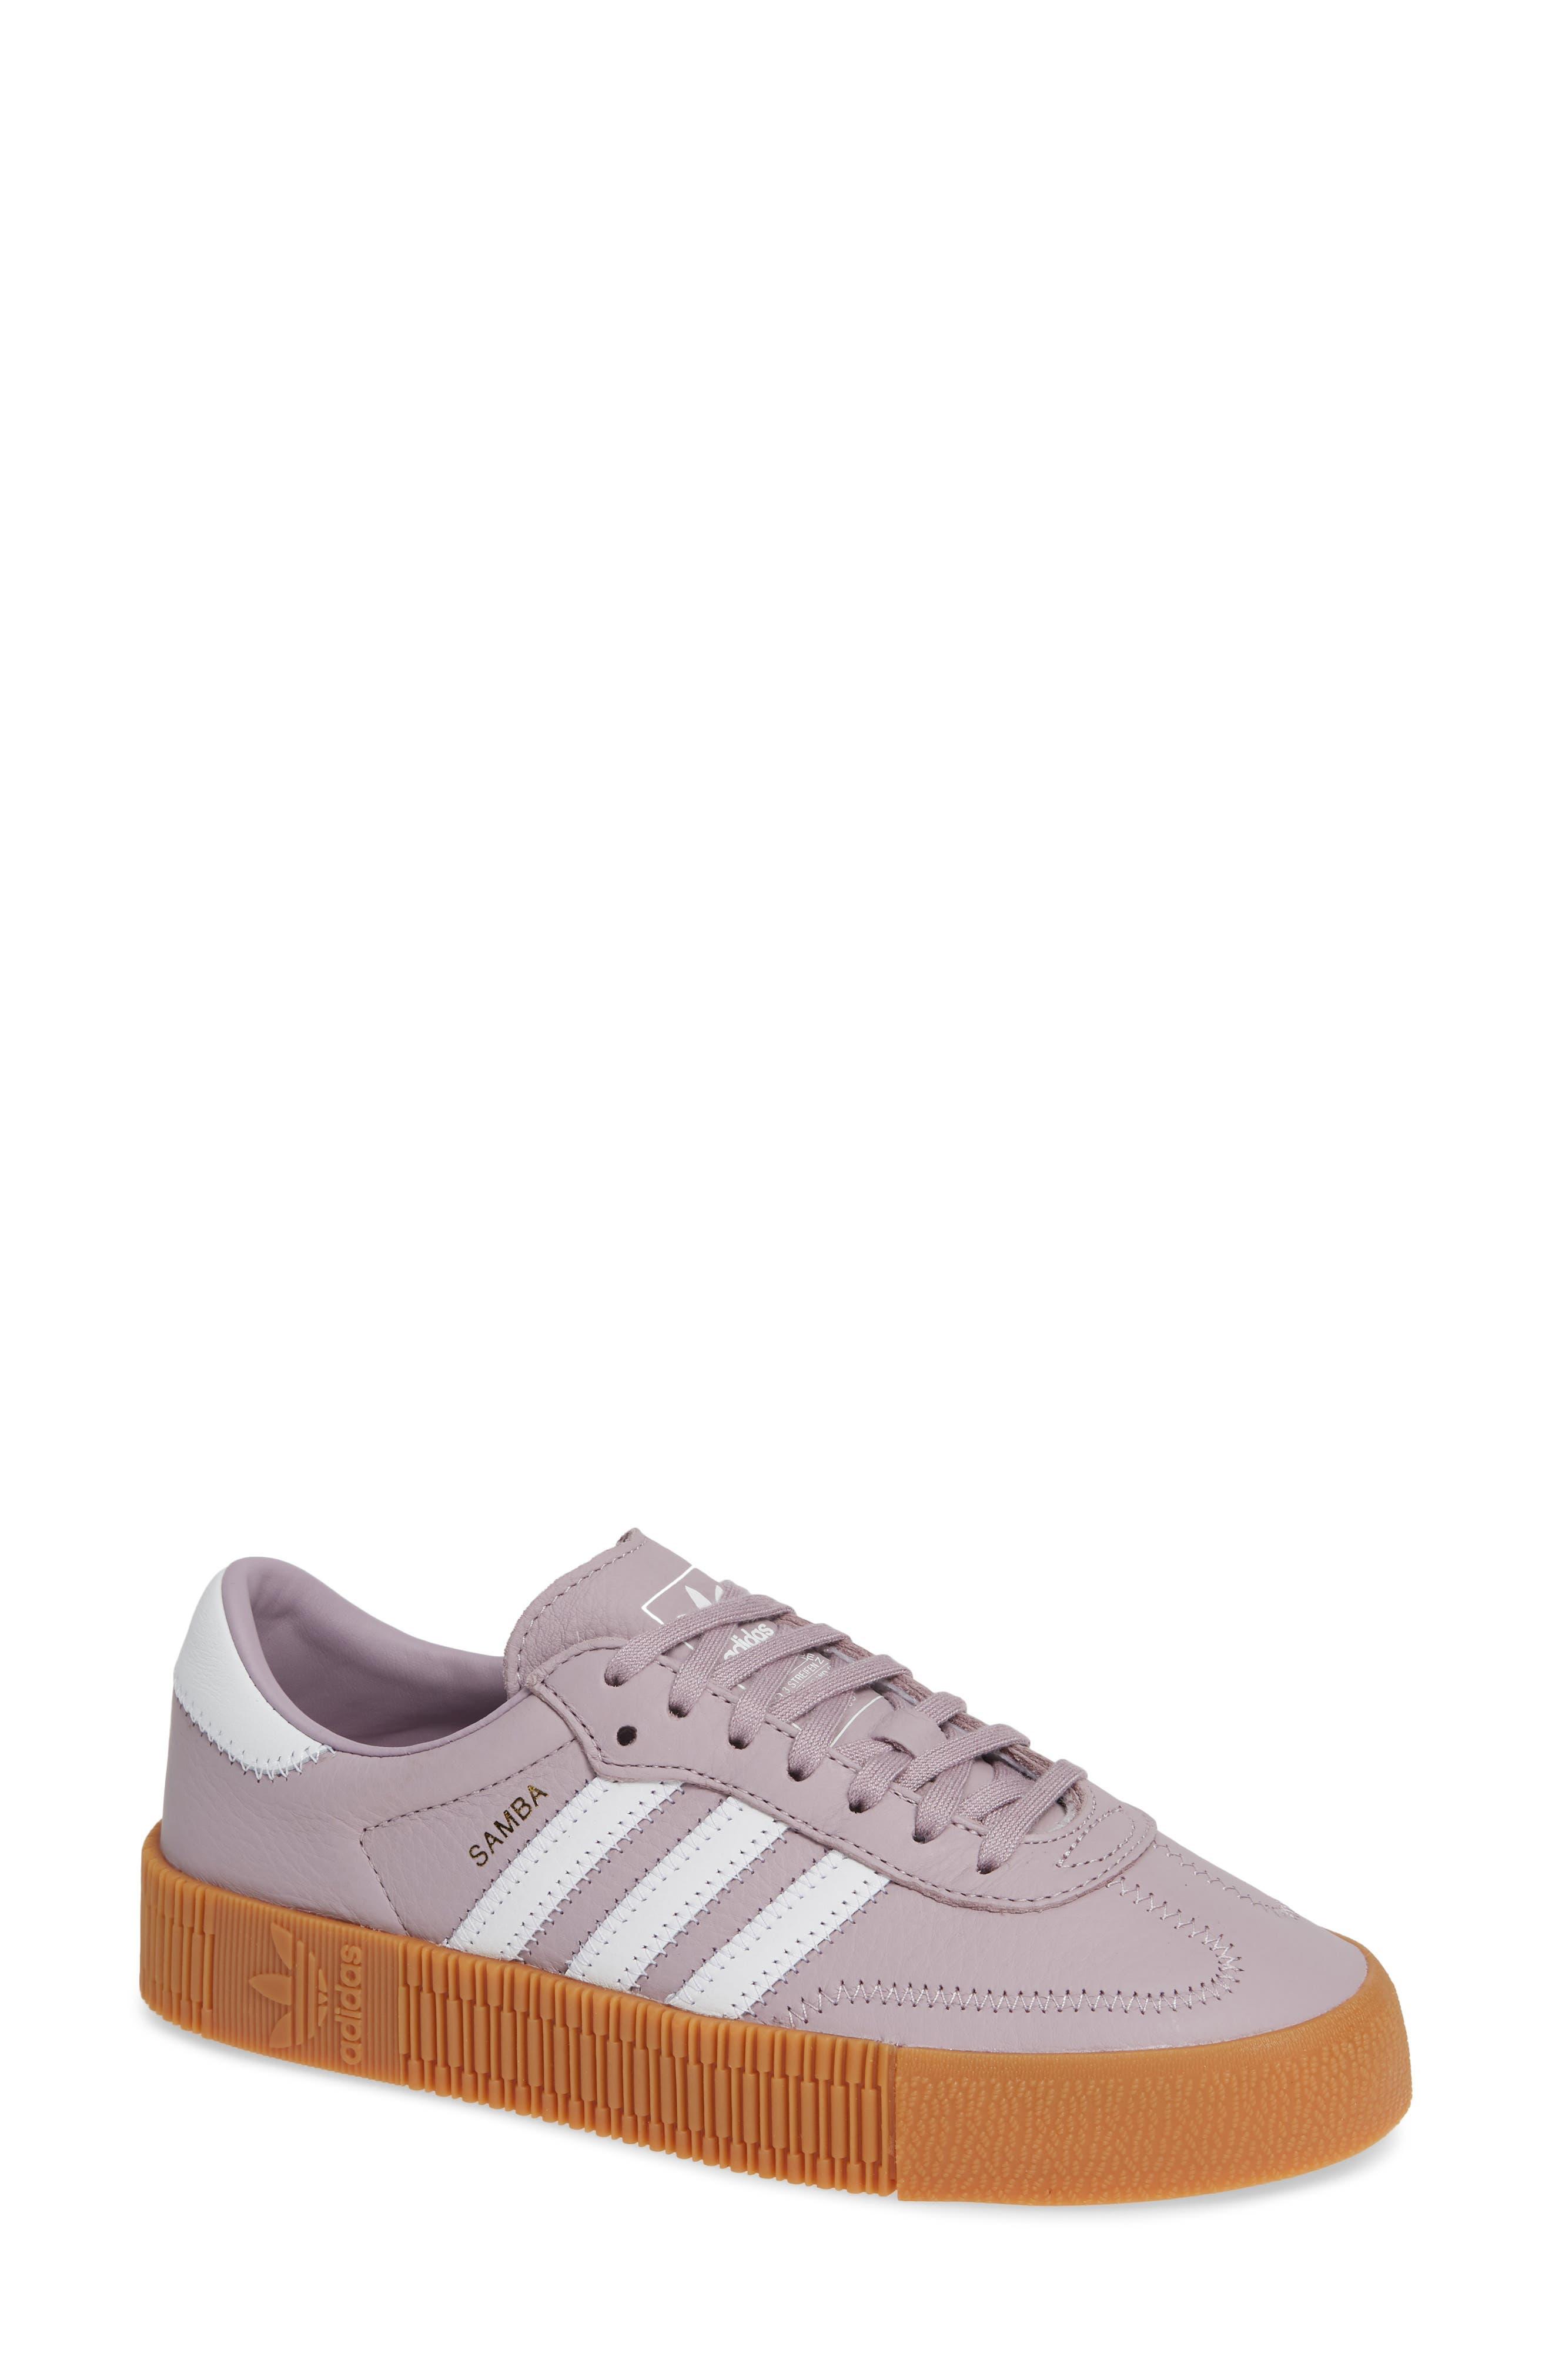 ADIDAS Samba Rose Sneaker, Main, color, SOFT VISION/ WHITE/ GUM